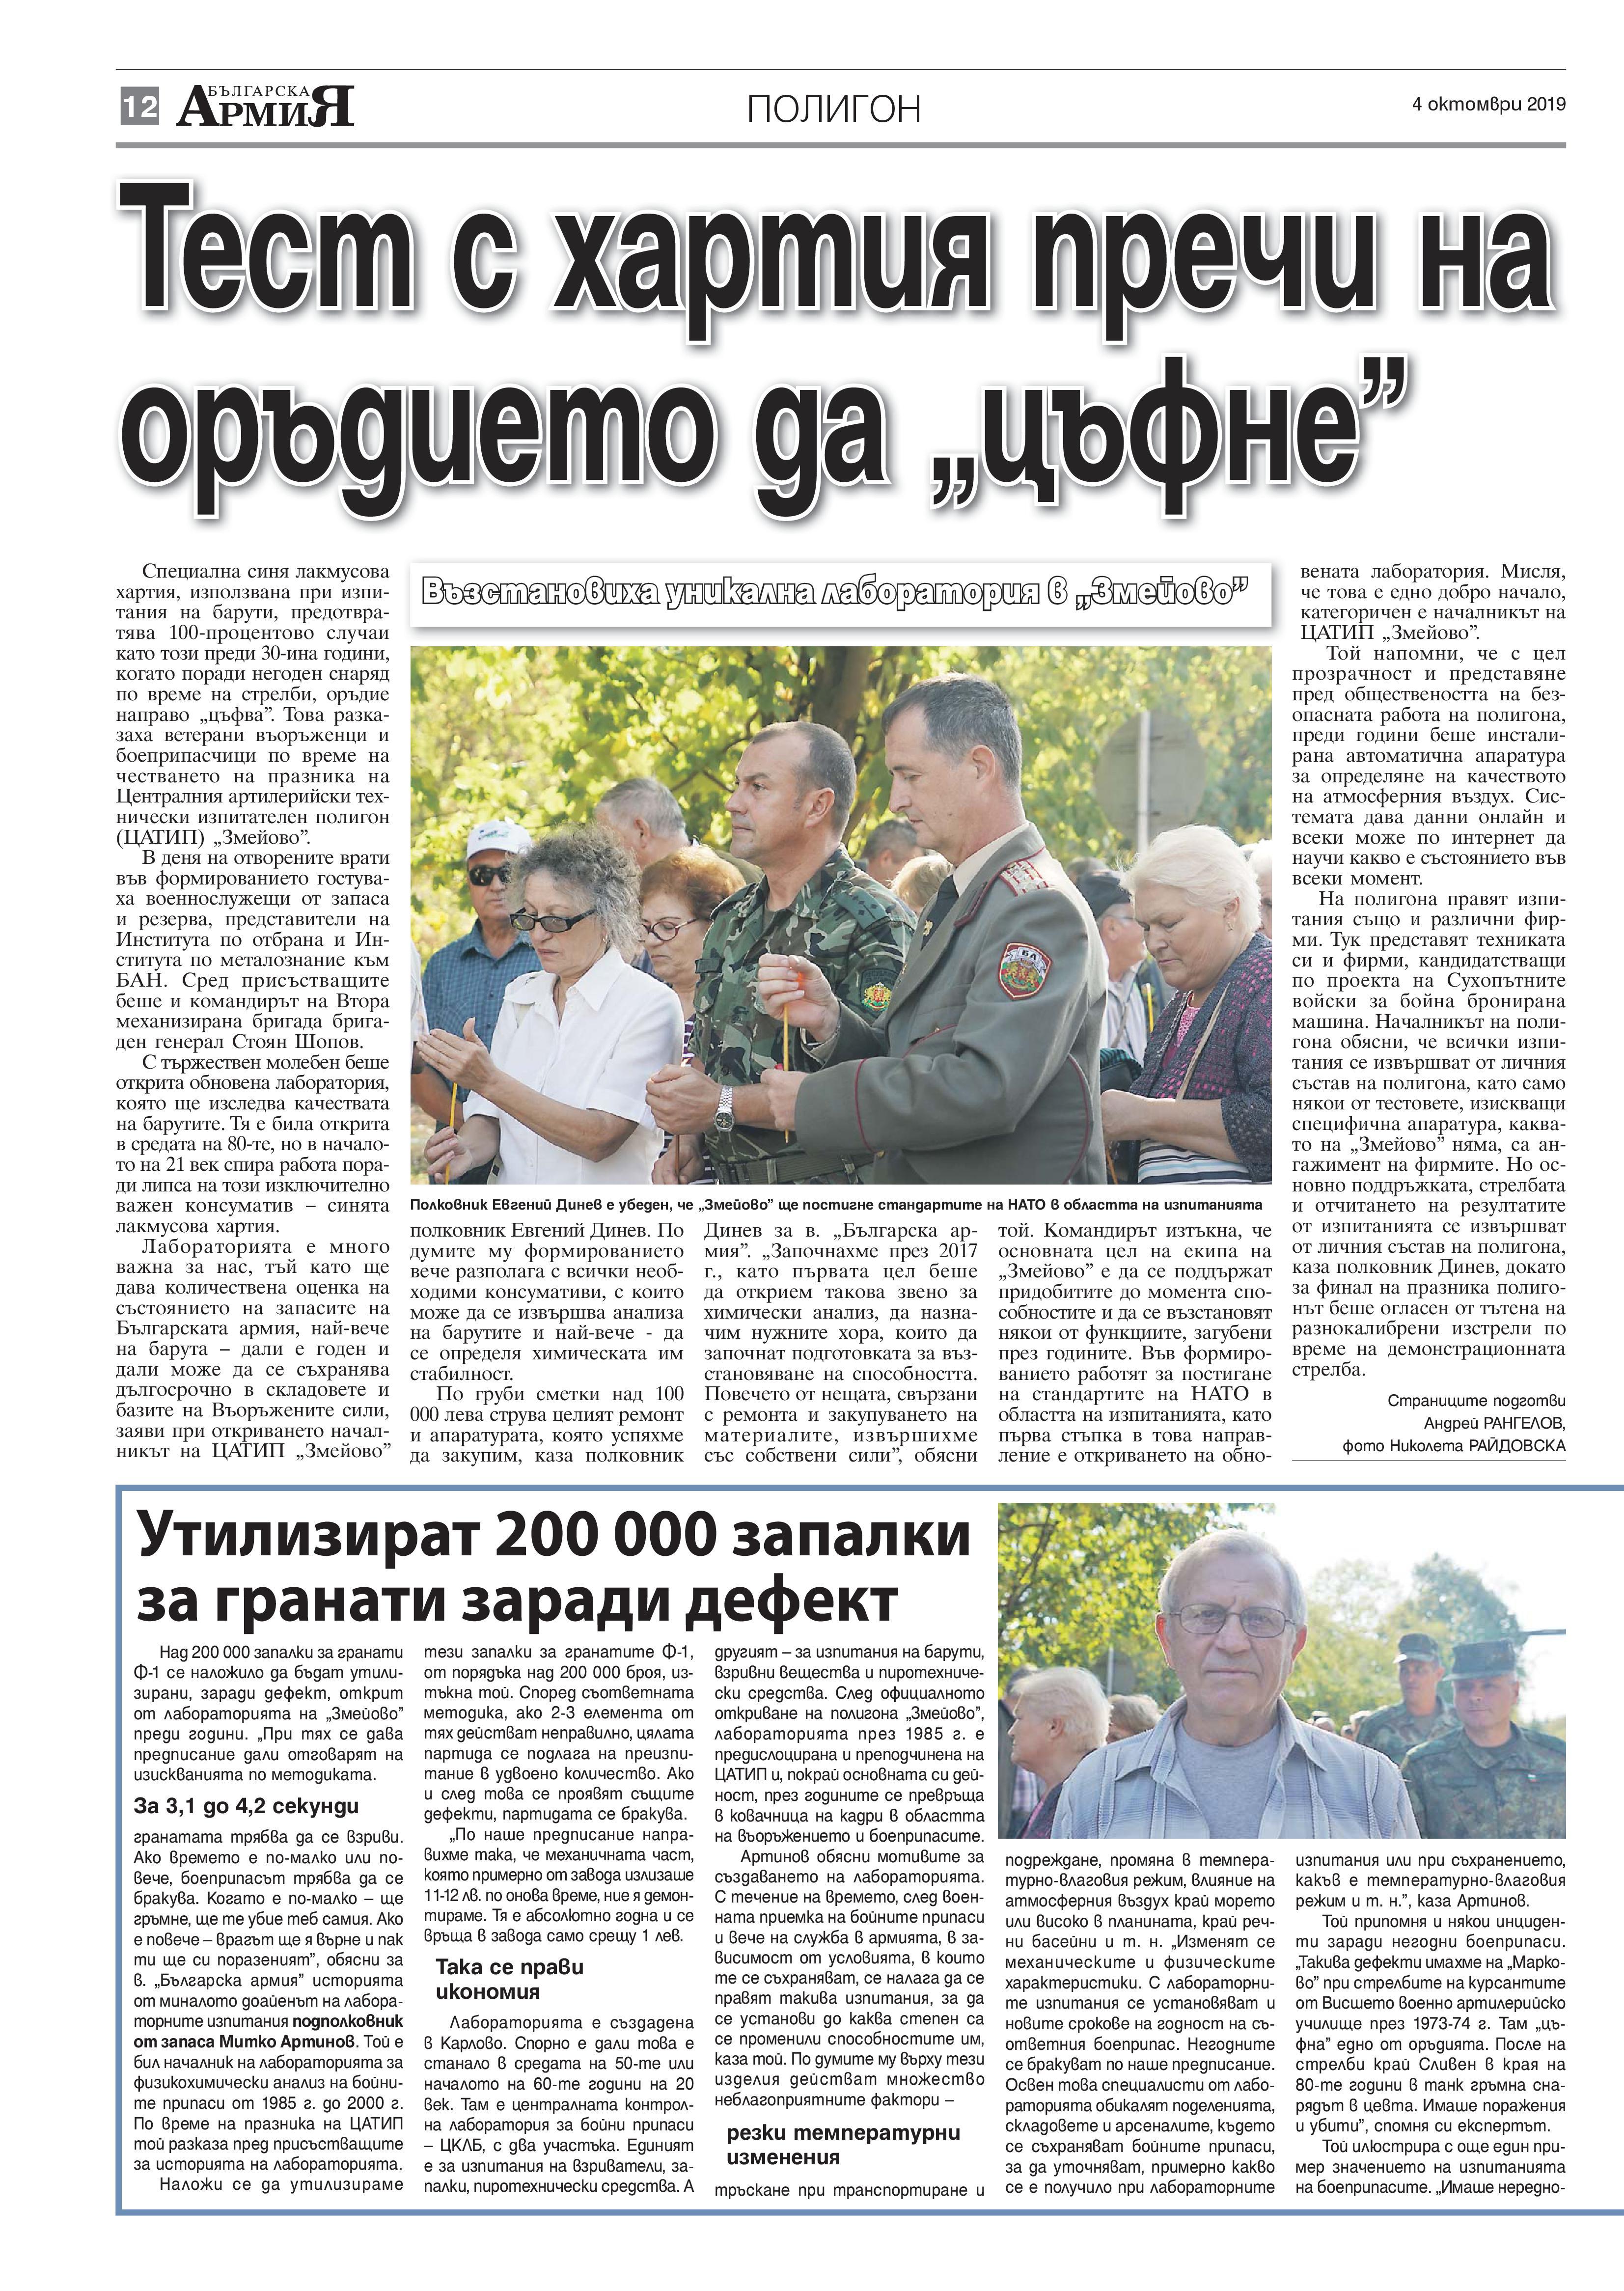 https://armymedia.bg/wp-content/uploads/2015/06/12-33.jpg